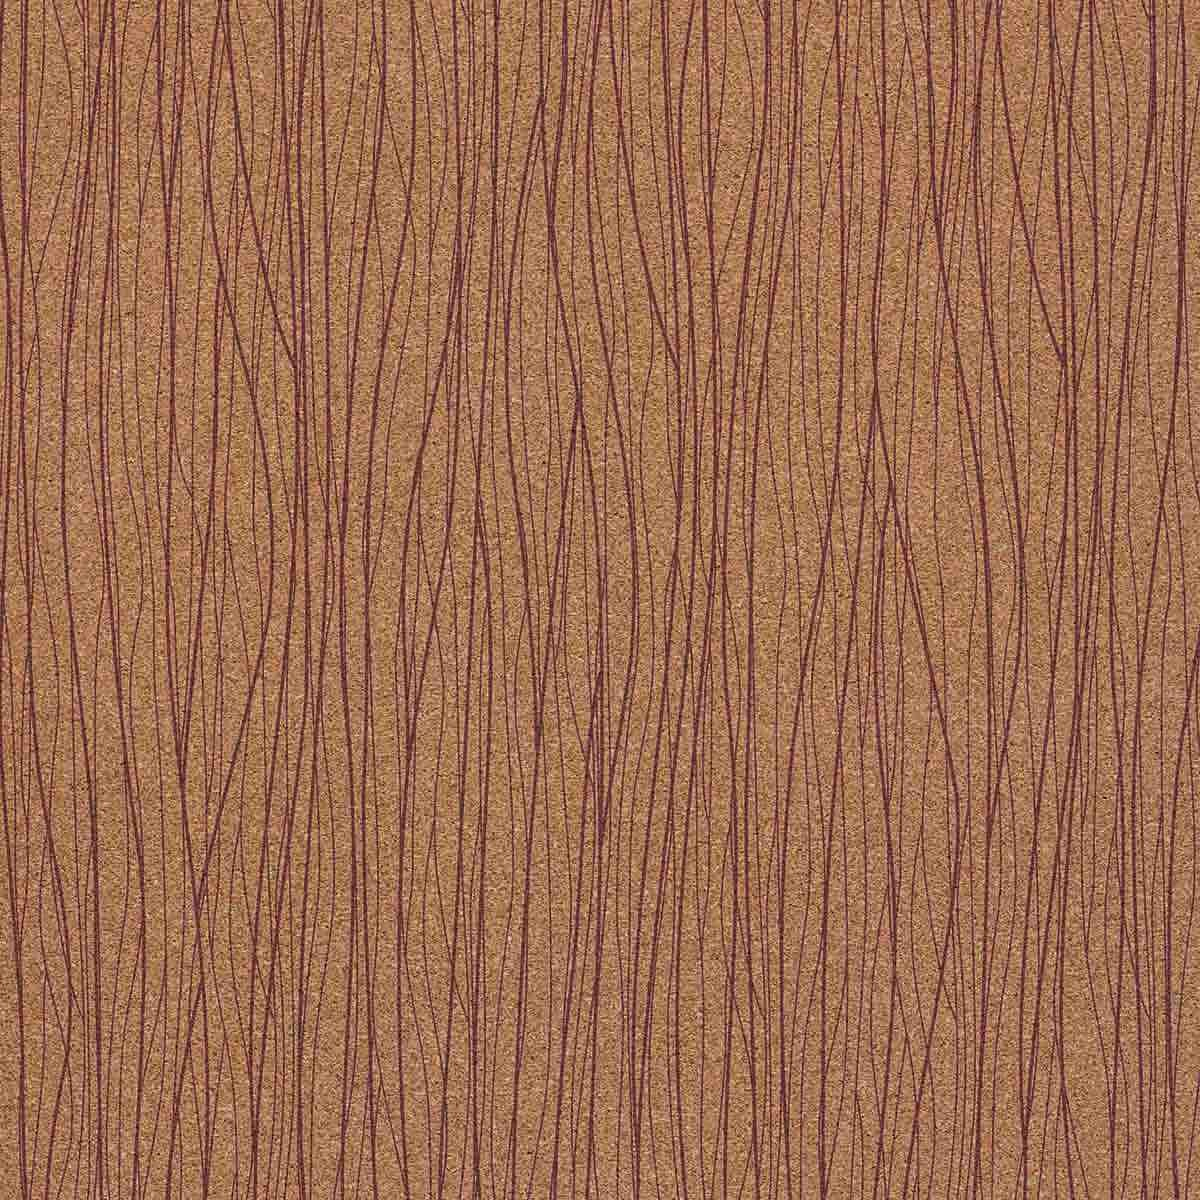 Decorative cork thin paper Connect Radiant Orchid Cork